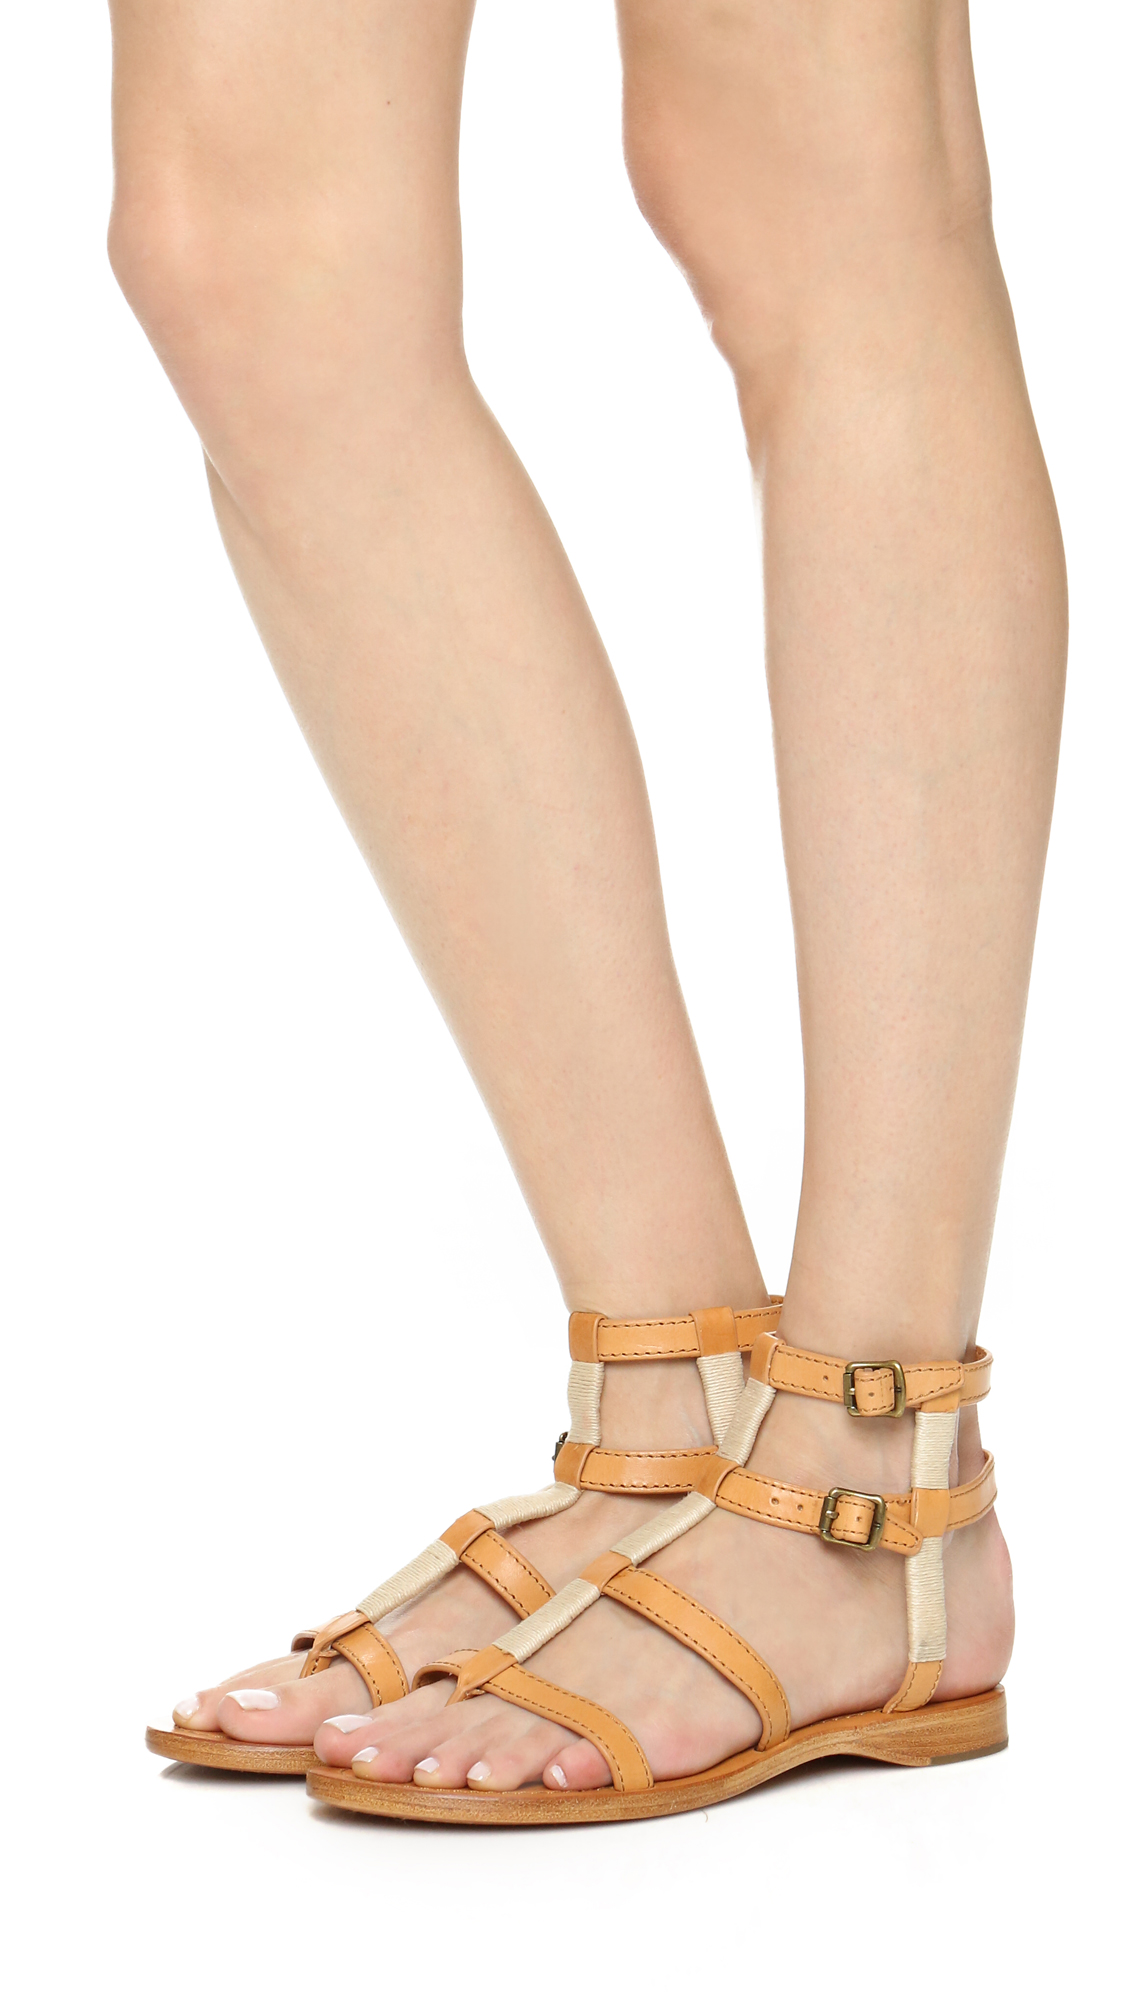 4c7c3c73e4b Frye Rachel Gladiator Sandals